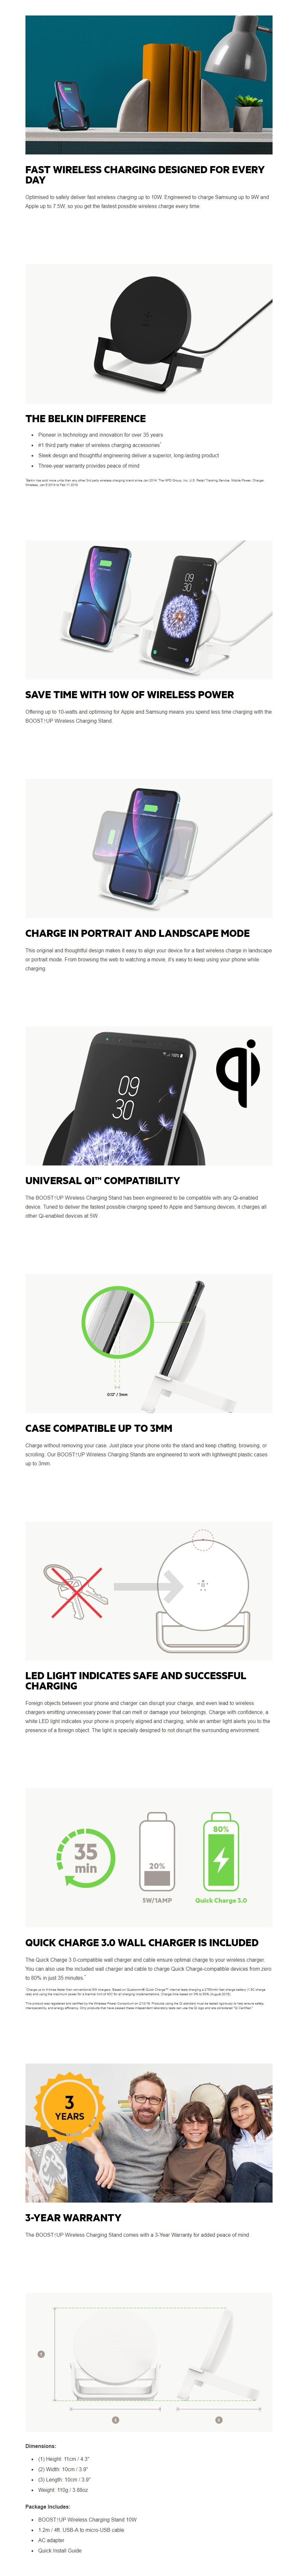 belkin-boost-up-10w-wirelafess-charging-stand-white-ac25909.jpg